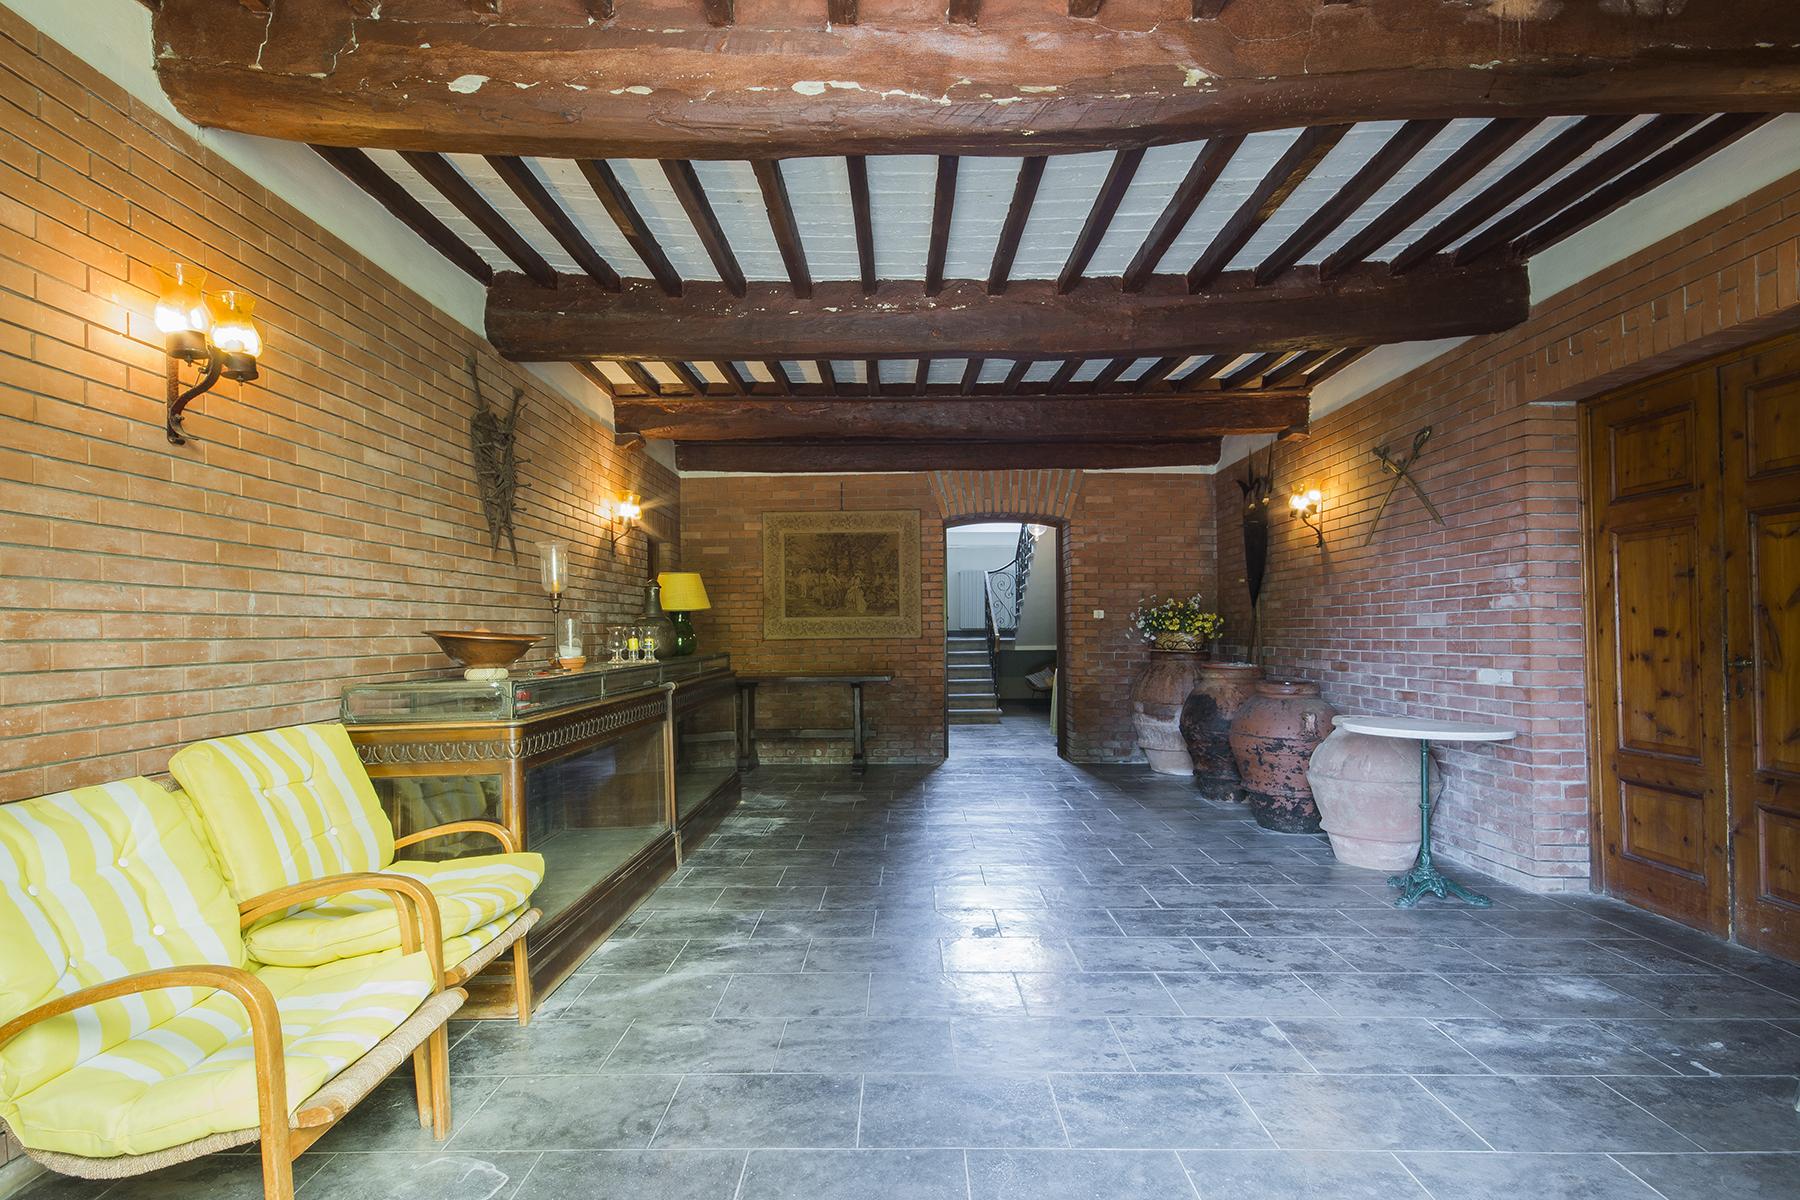 Villa in Vendita a Lucca: 5 locali, 1210 mq - Foto 16